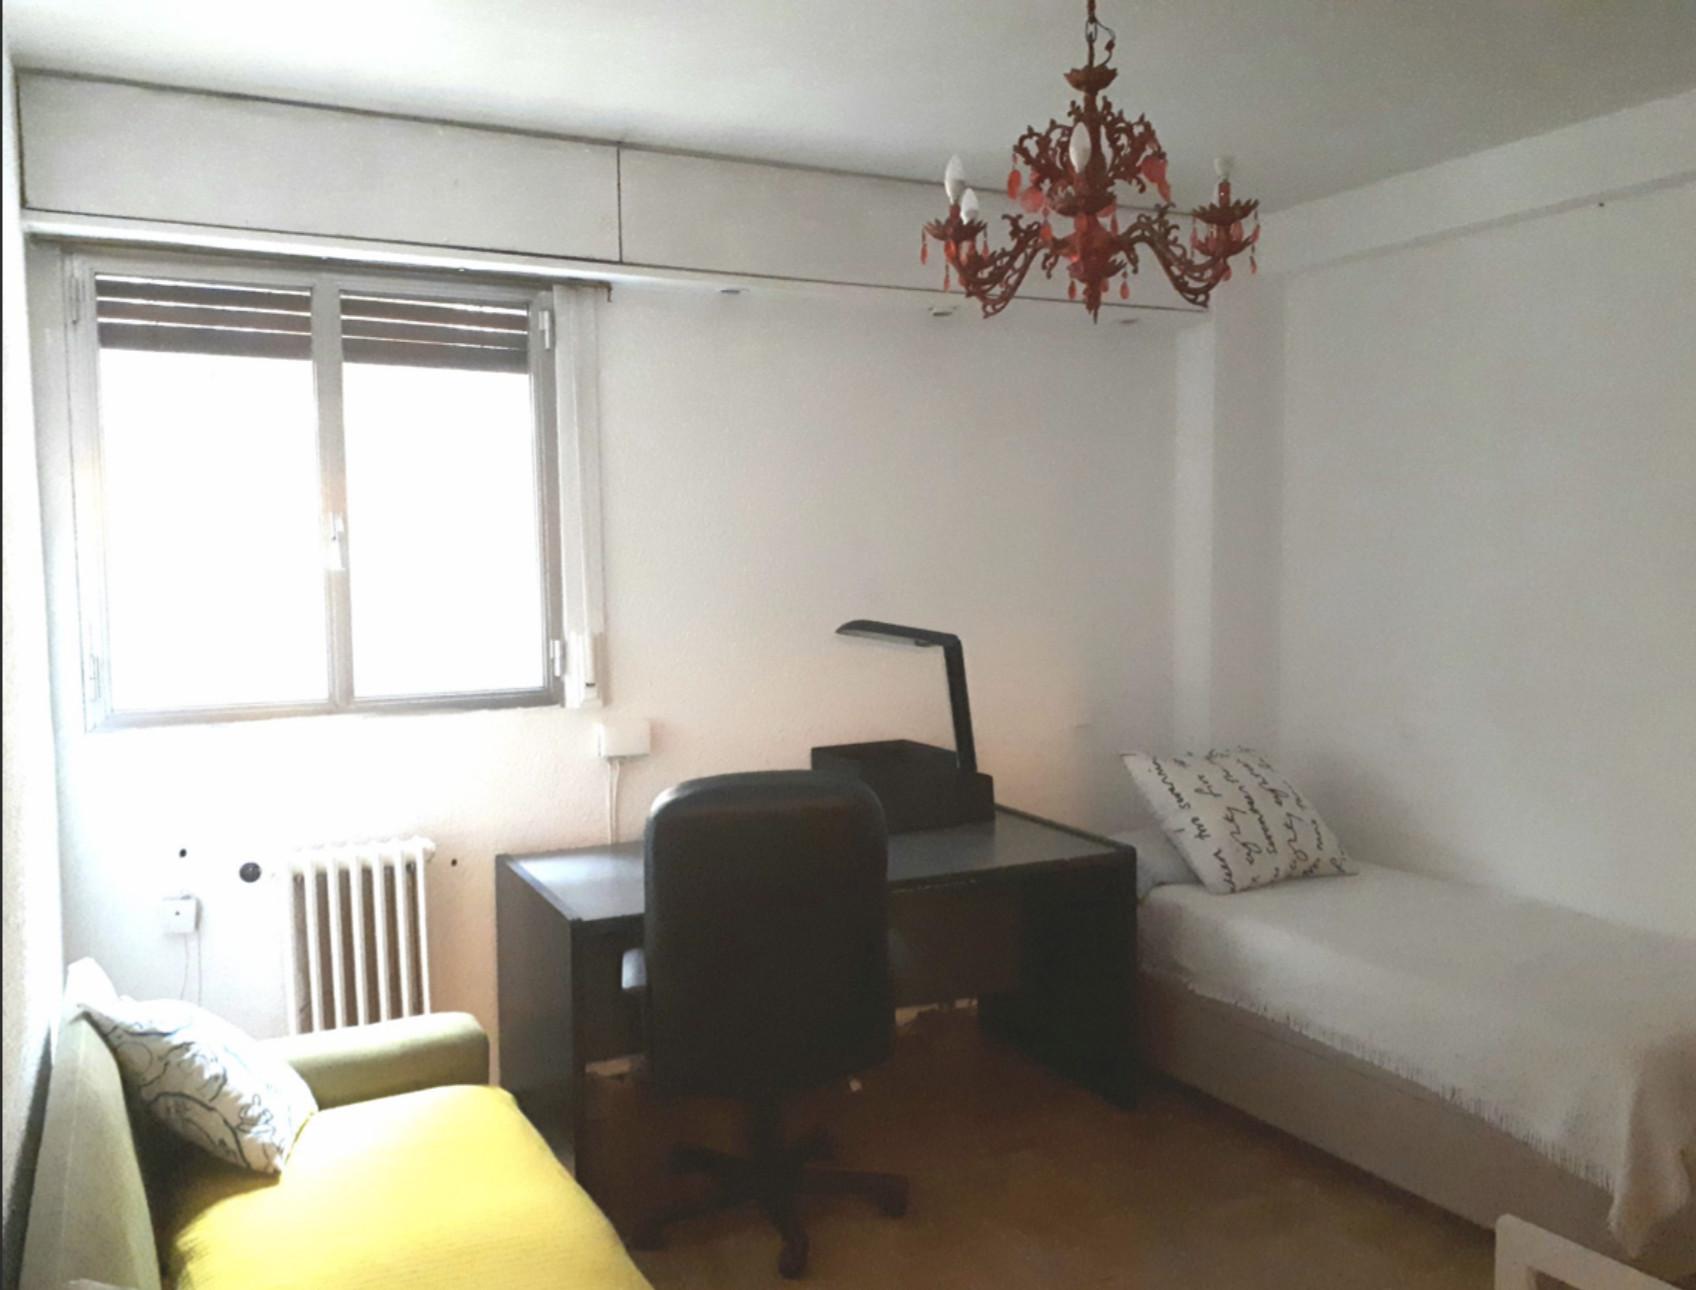 individual-room-shared-apartment-15-20-min-ucm-upm-859ad72e362cd8ccbc3eb98537bb517a